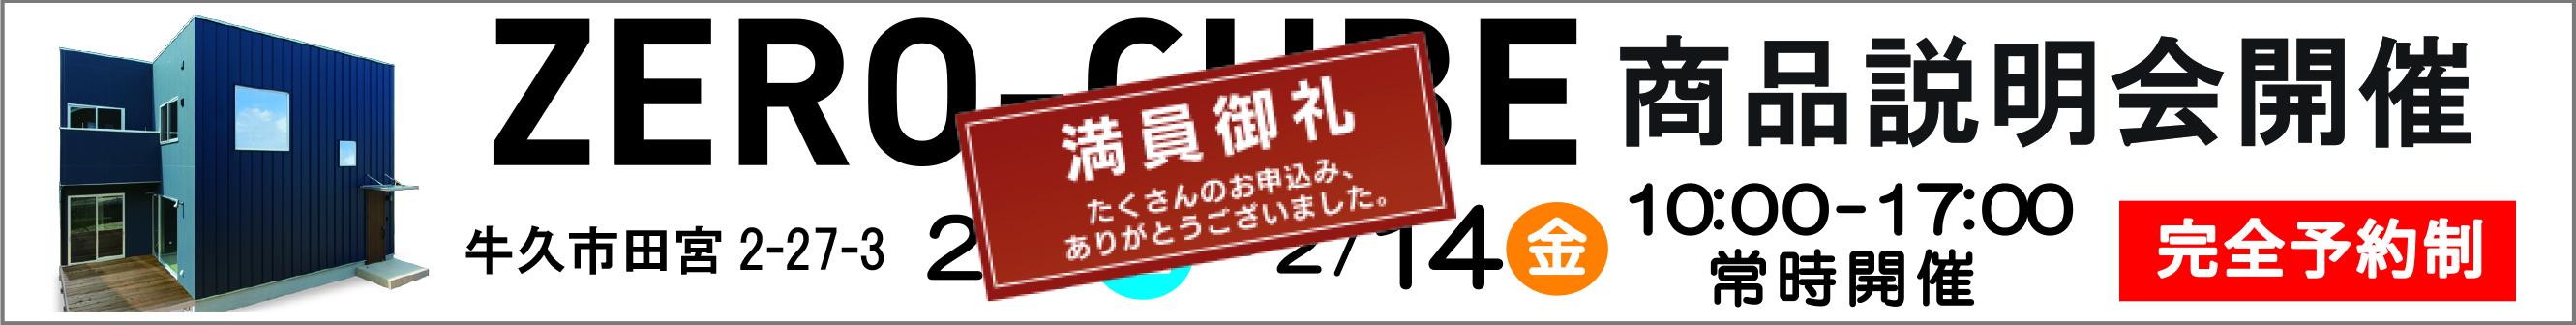 ZERO-CUBE商品説明会